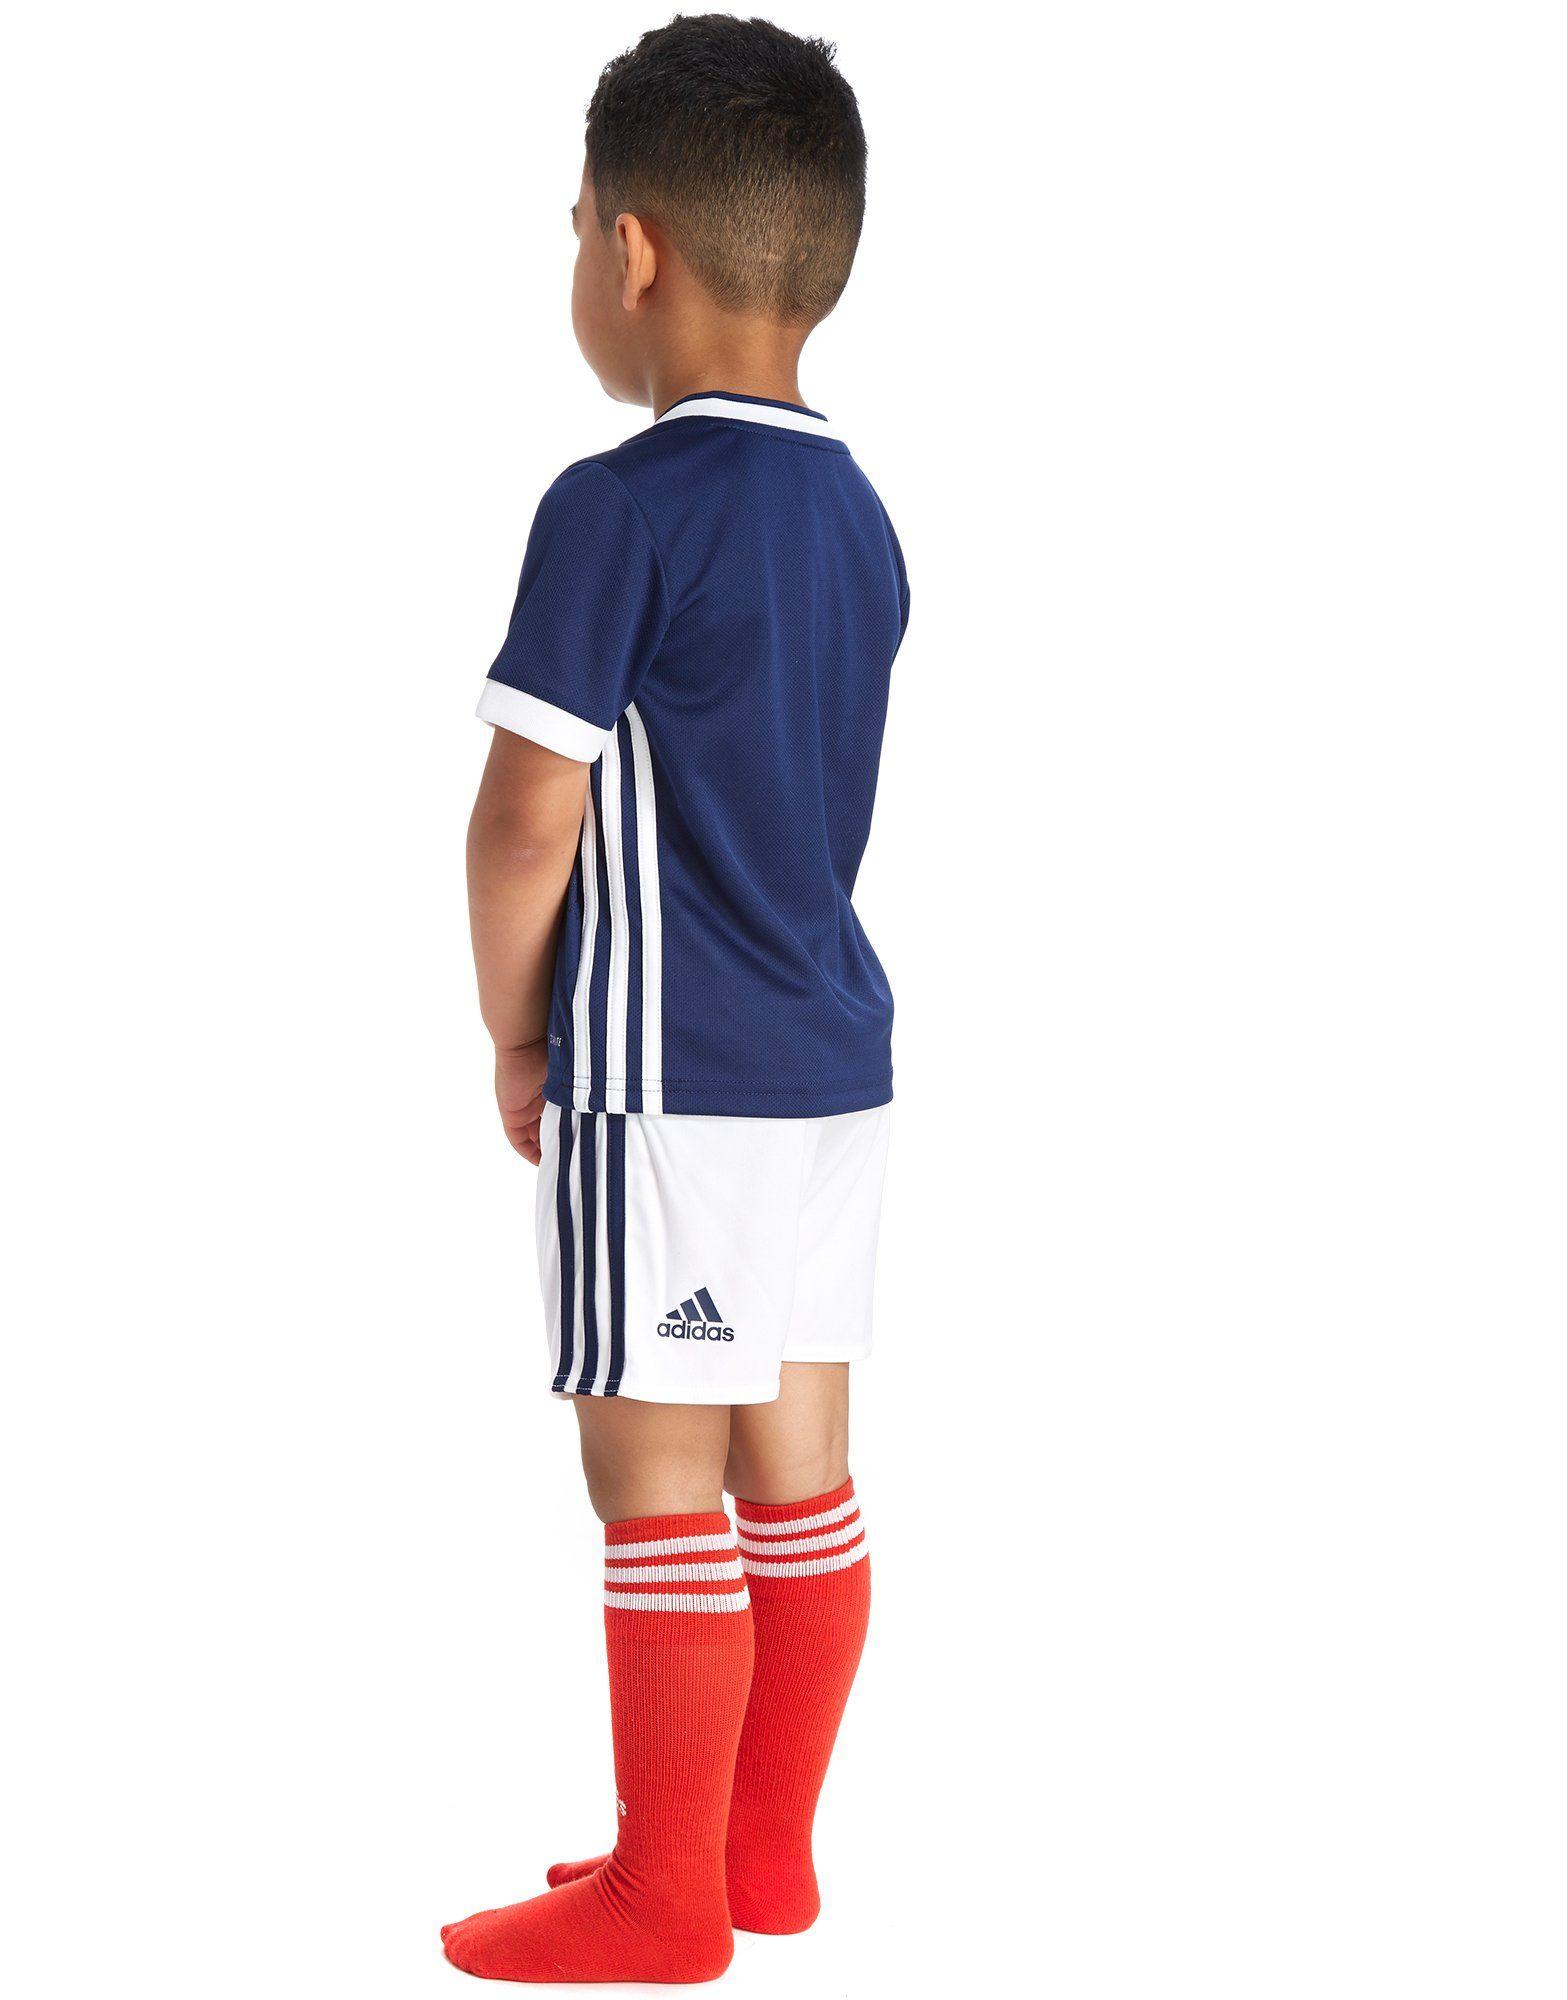 adidas Scotland 2018/19 Home Kit Children